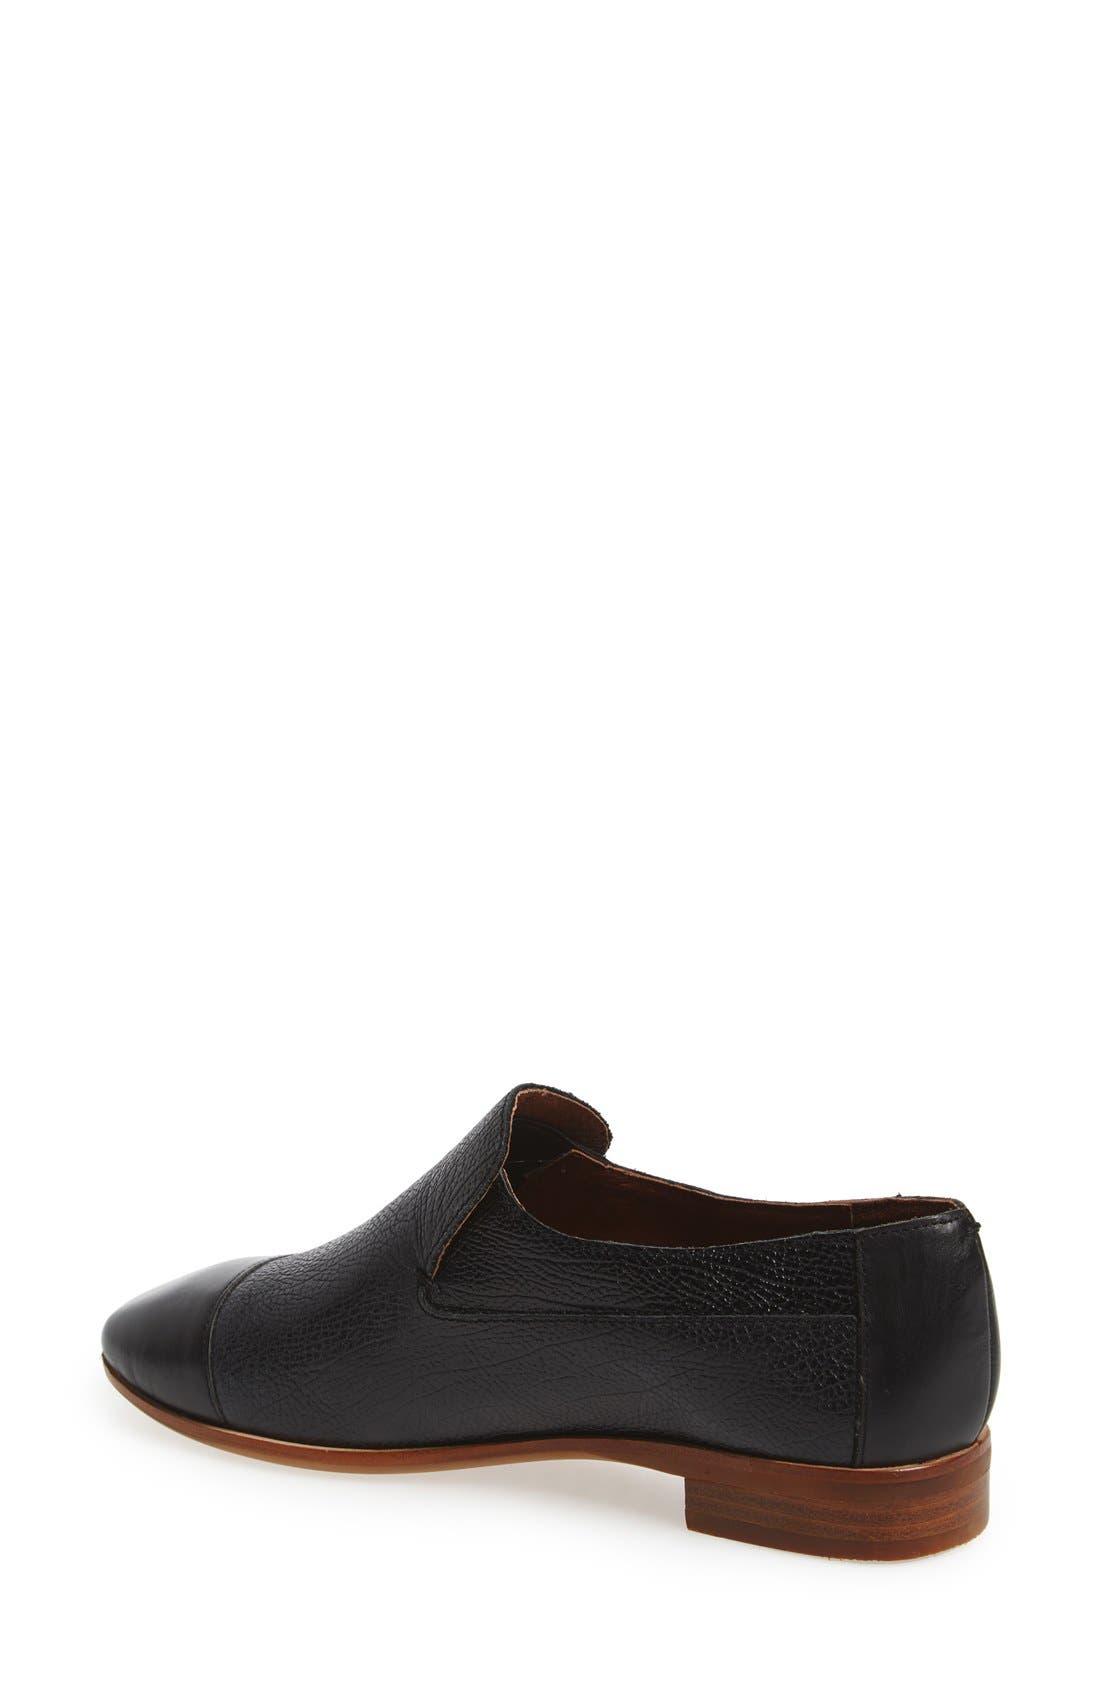 'Bryant' Cap Toe Loafer,                             Alternate thumbnail 2, color,                             BLACK LEATHER